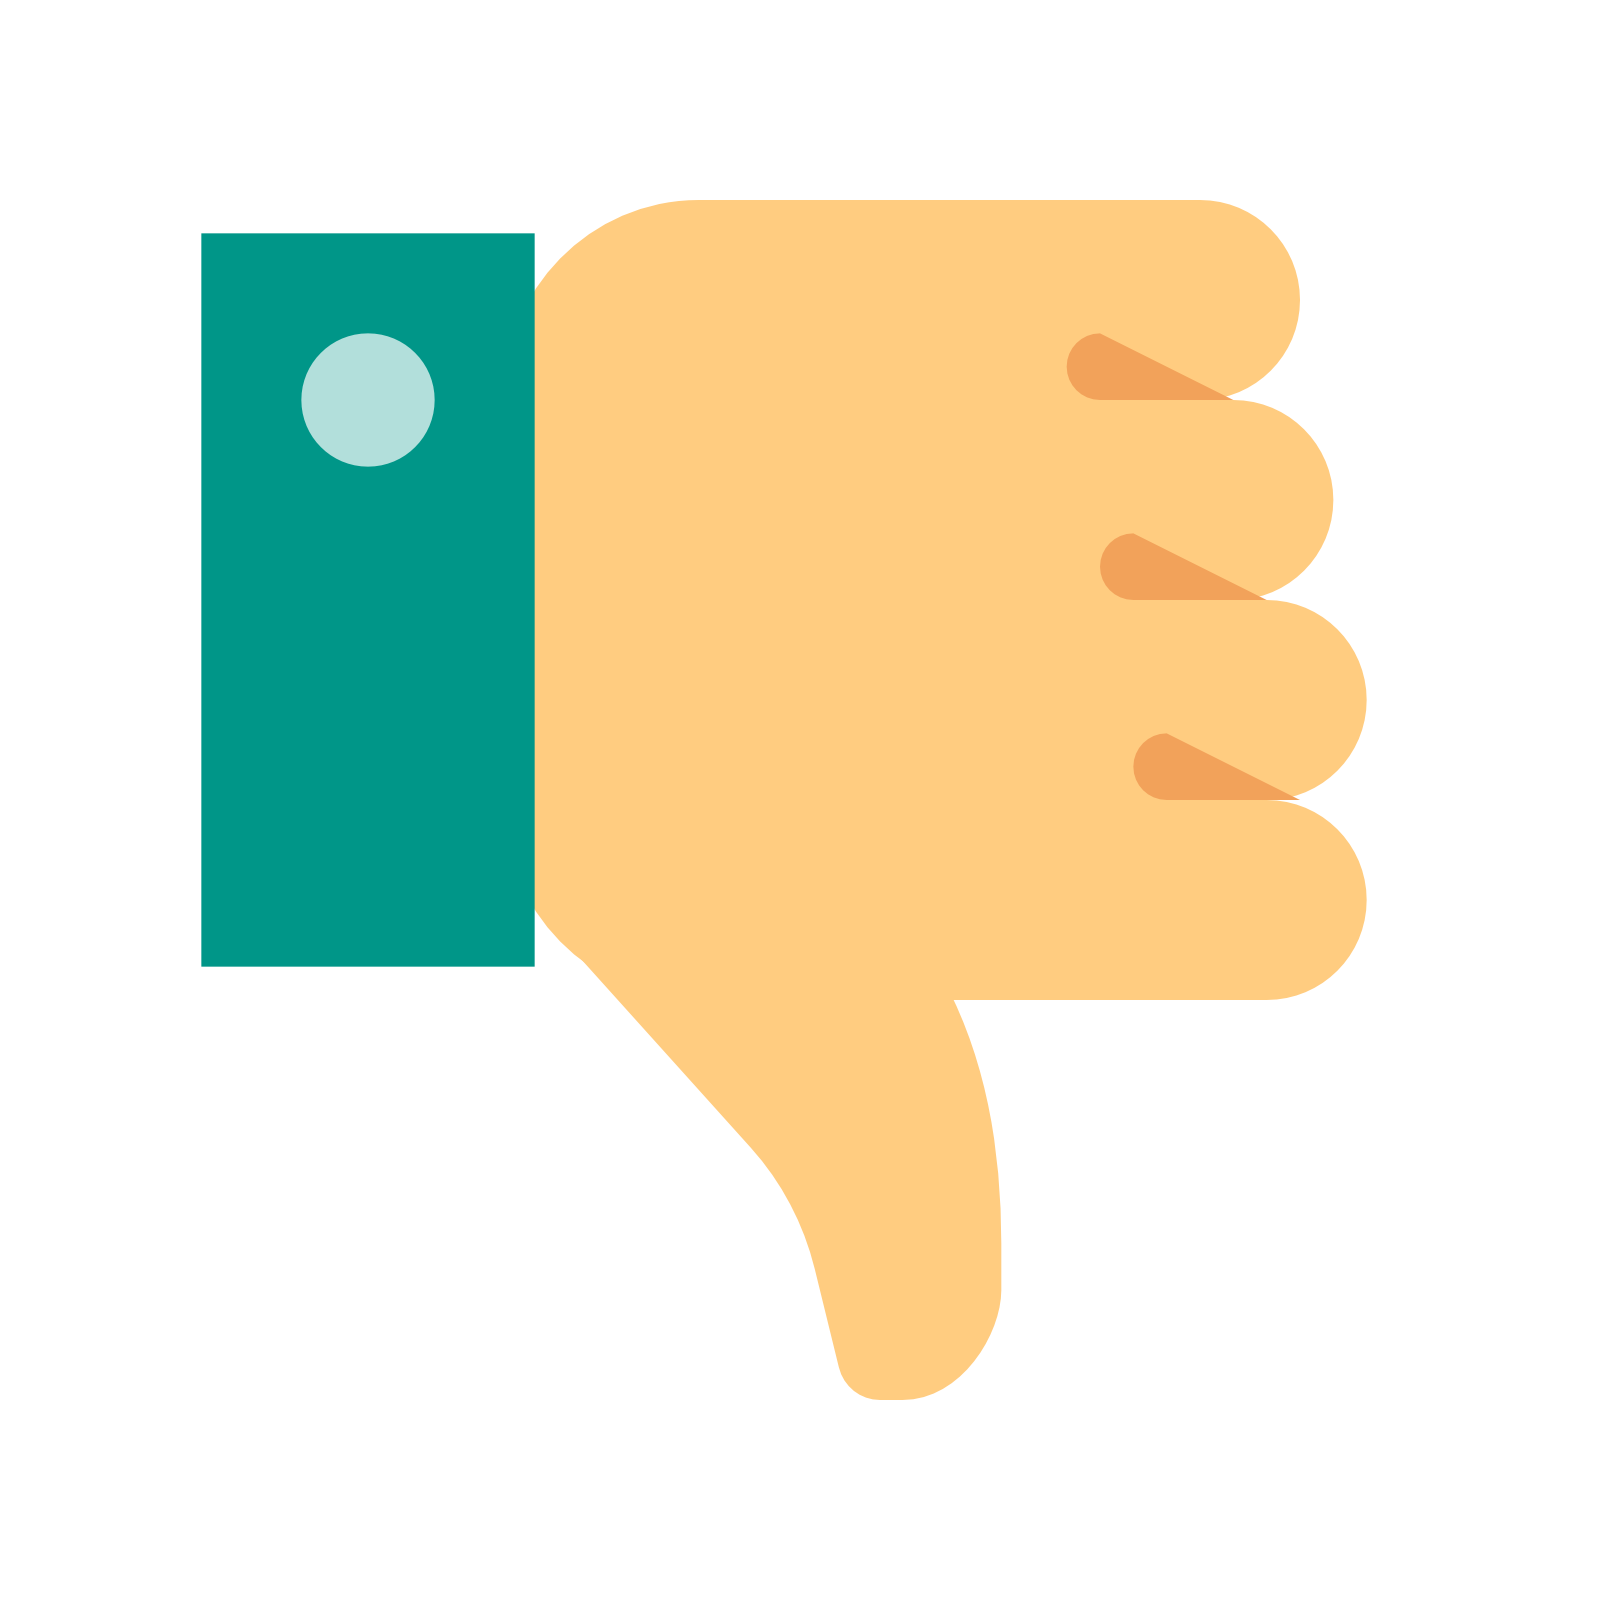 Thumbs Down icon